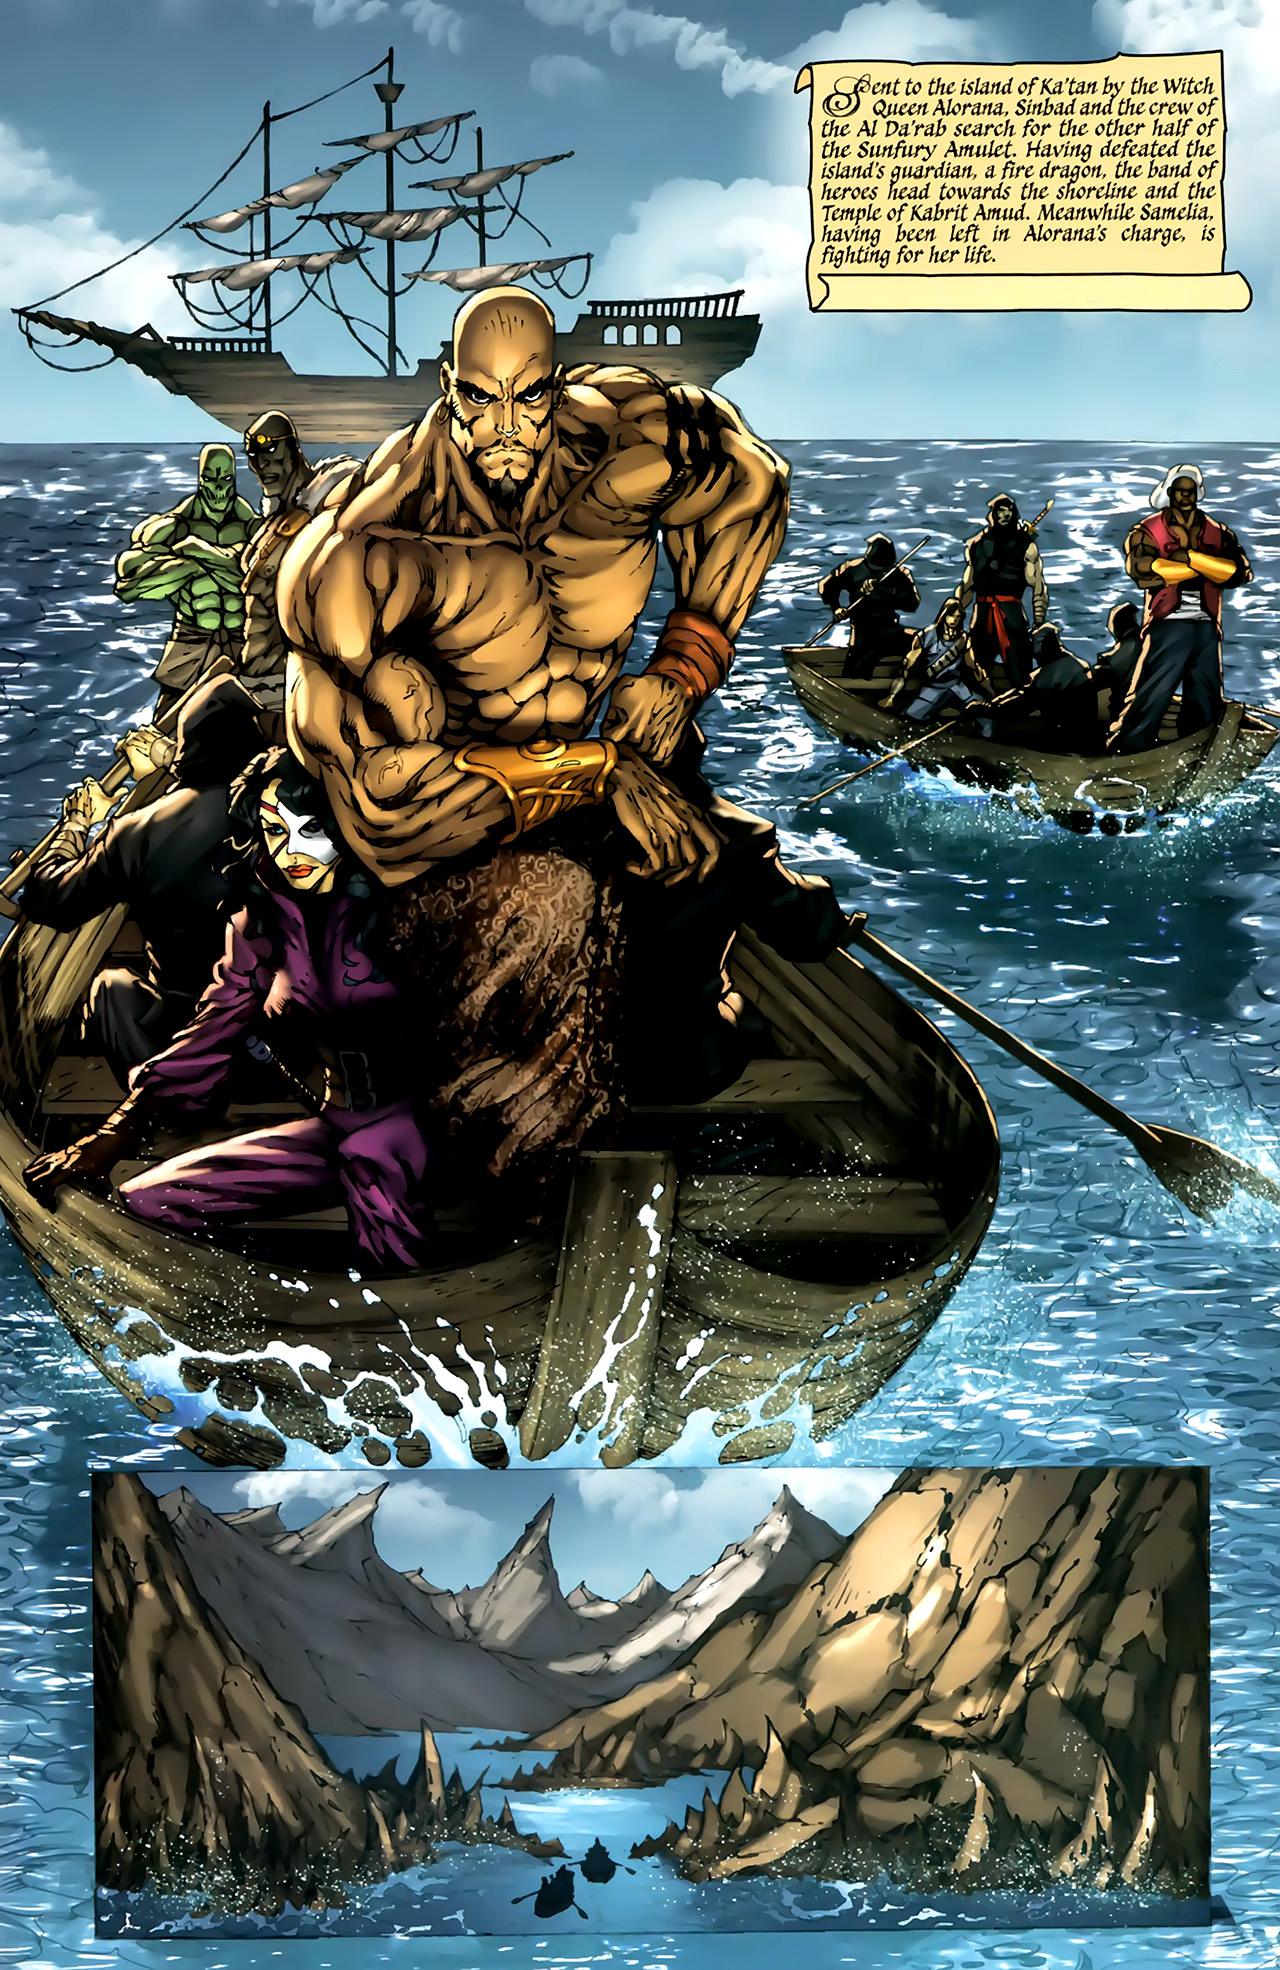 Read online 1001 Arabian Nights: The Adventures of Sinbad comic -  Issue #4 - 5